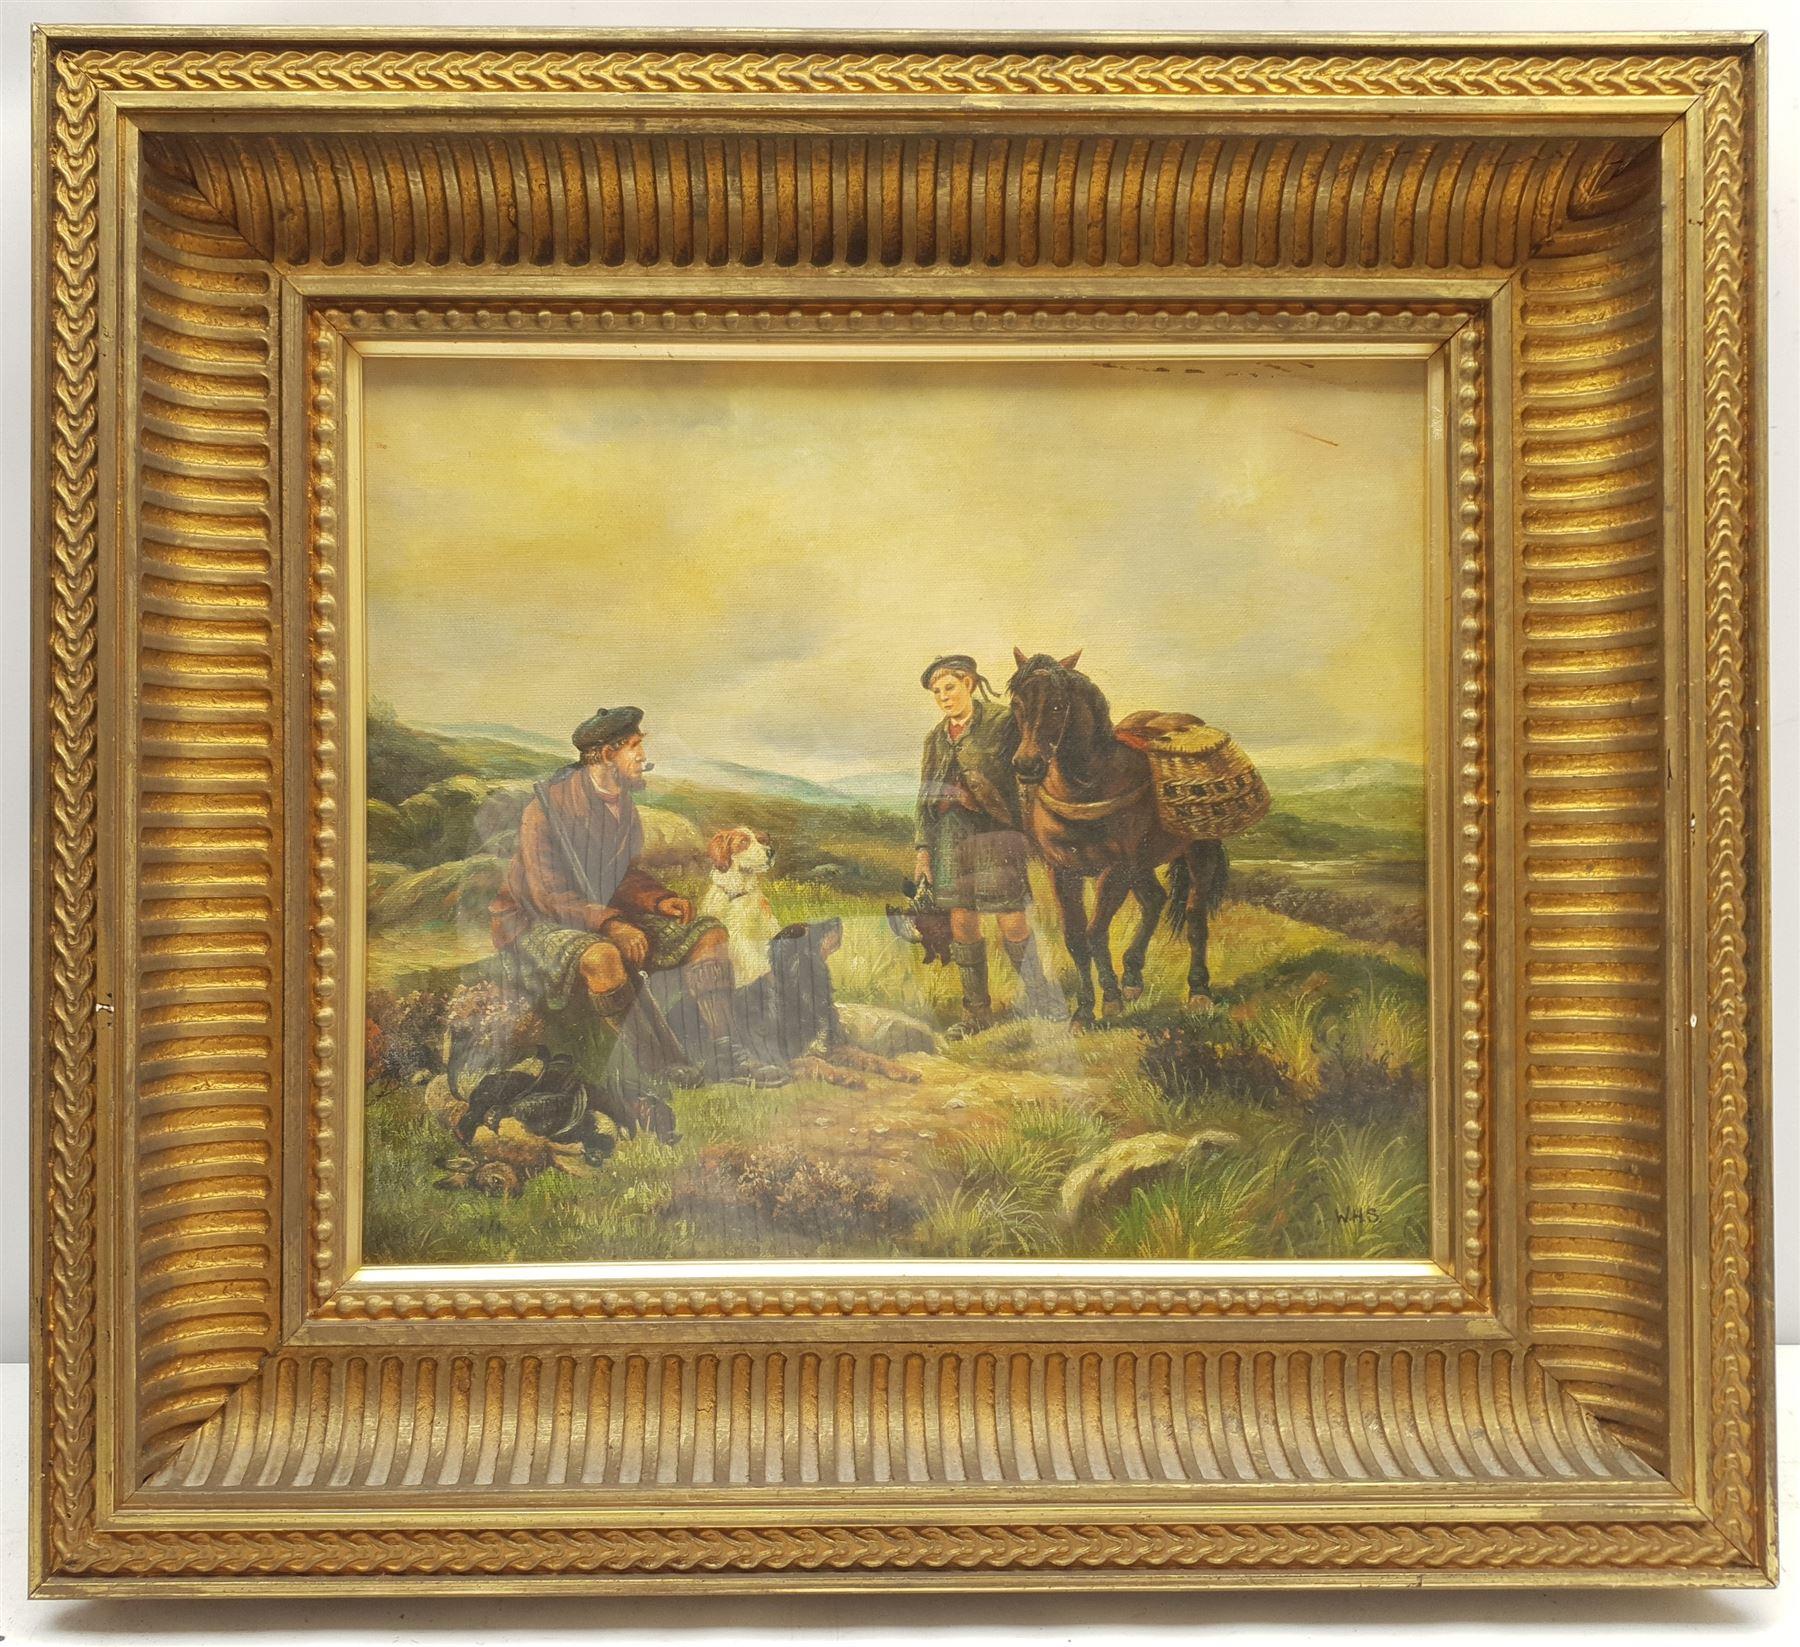 Attrib. William Hamilton Snape (British 1862-1904): Scottish Hunters Taking a Rest - Image 2 of 3